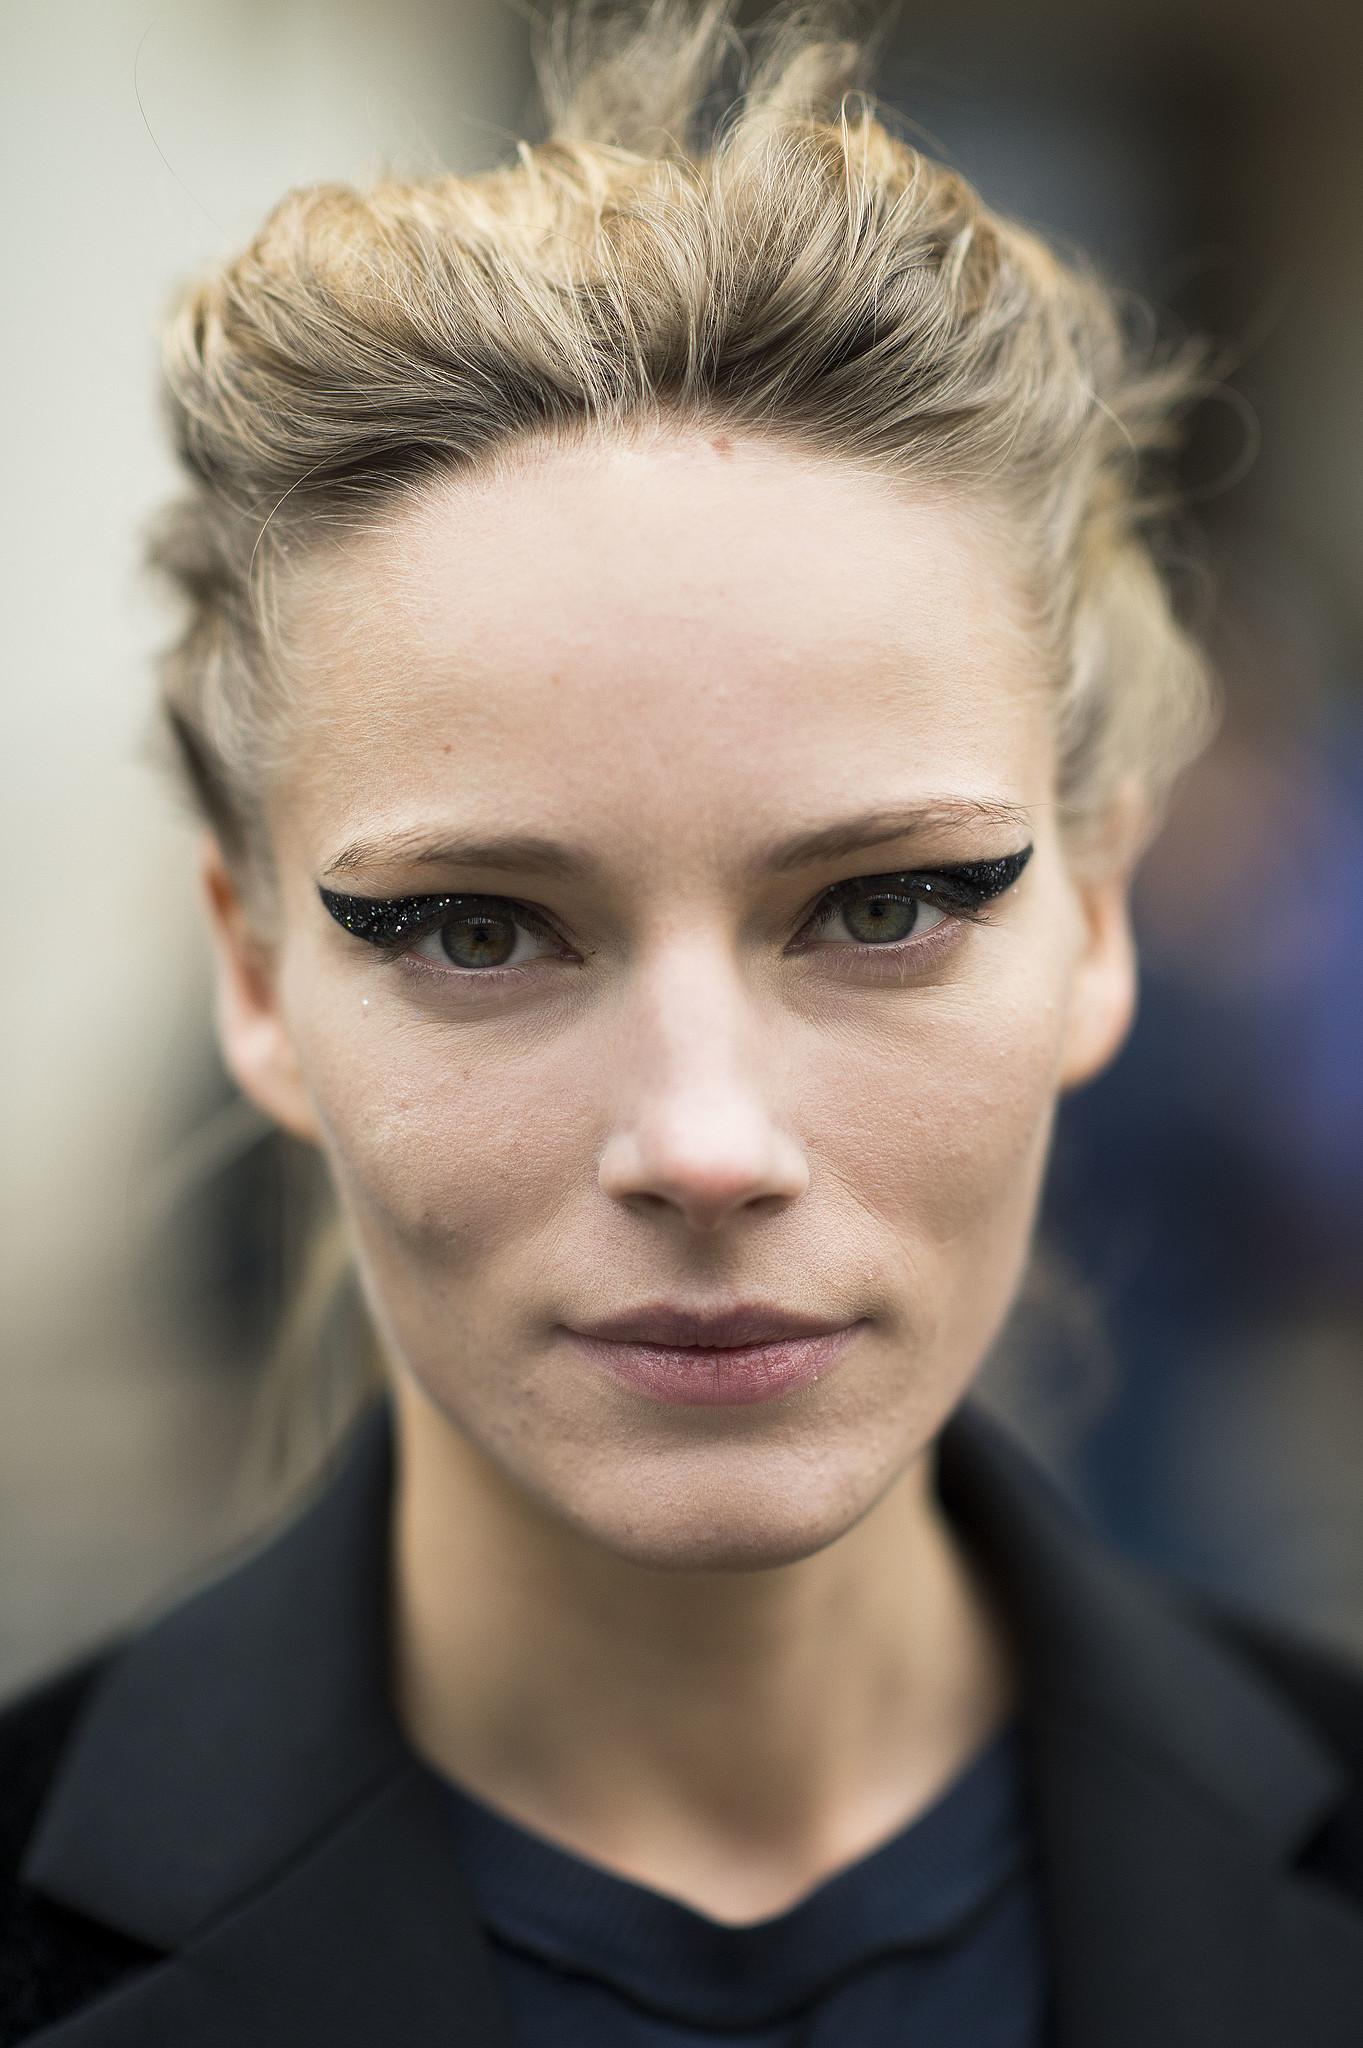 This woman wins the eyeliner game. Source: Le 21ème | Adam Katz Sinding